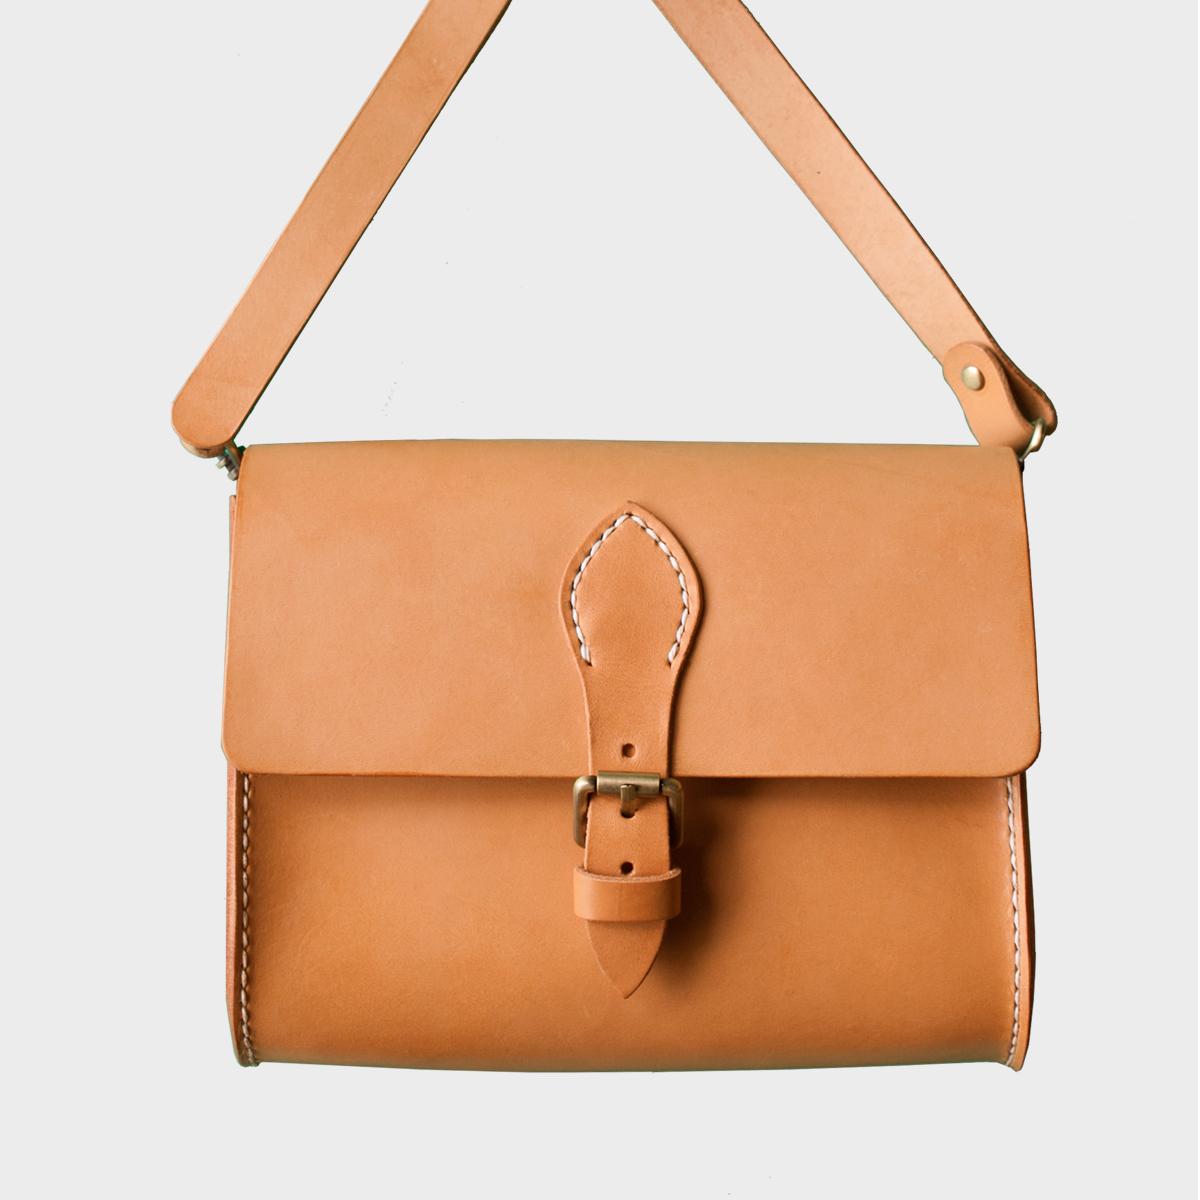 極簡隨身包Portable Bag NT$ 3,980  HDA0006